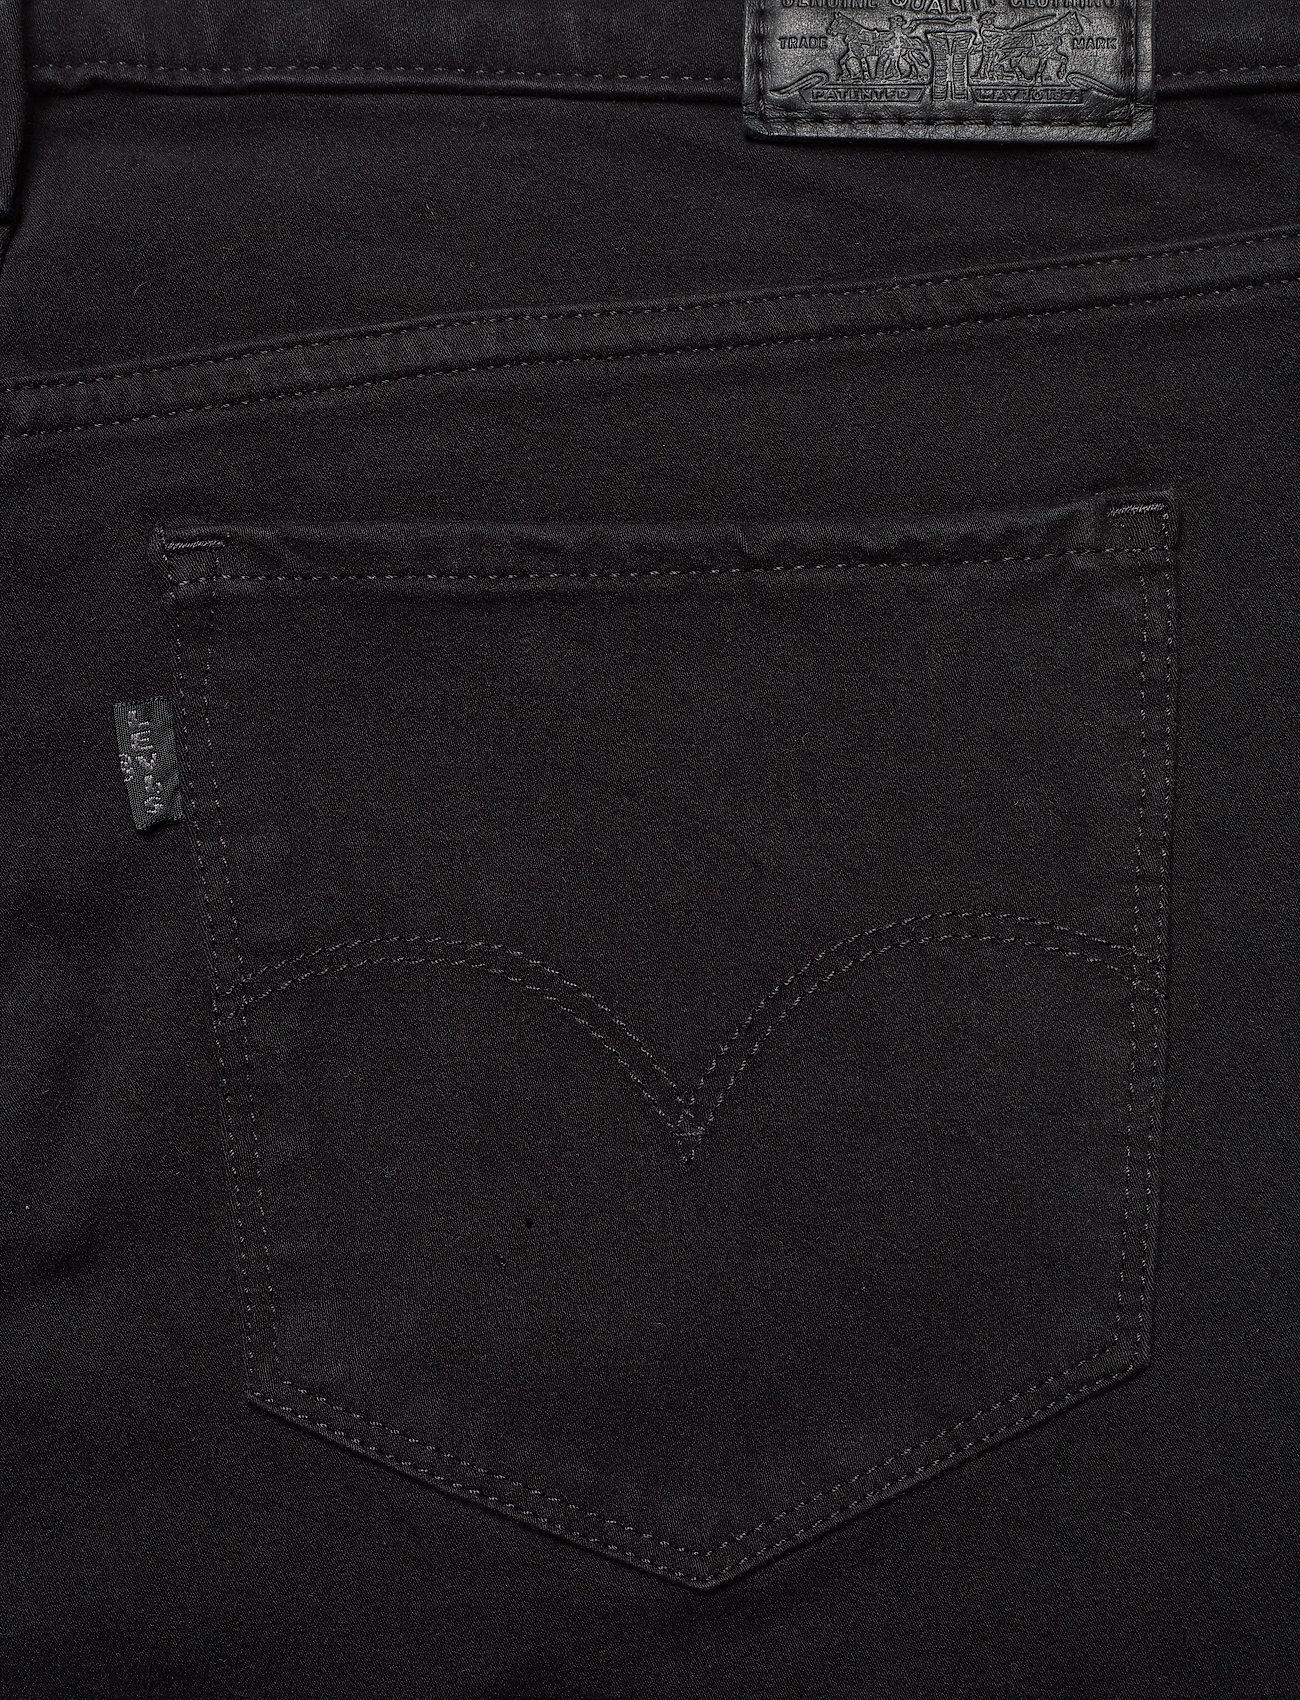 311 Pl Shaping Skinny 4x Stret (Blacks) (74.96 €) - Levi's Plus Size Uia0B